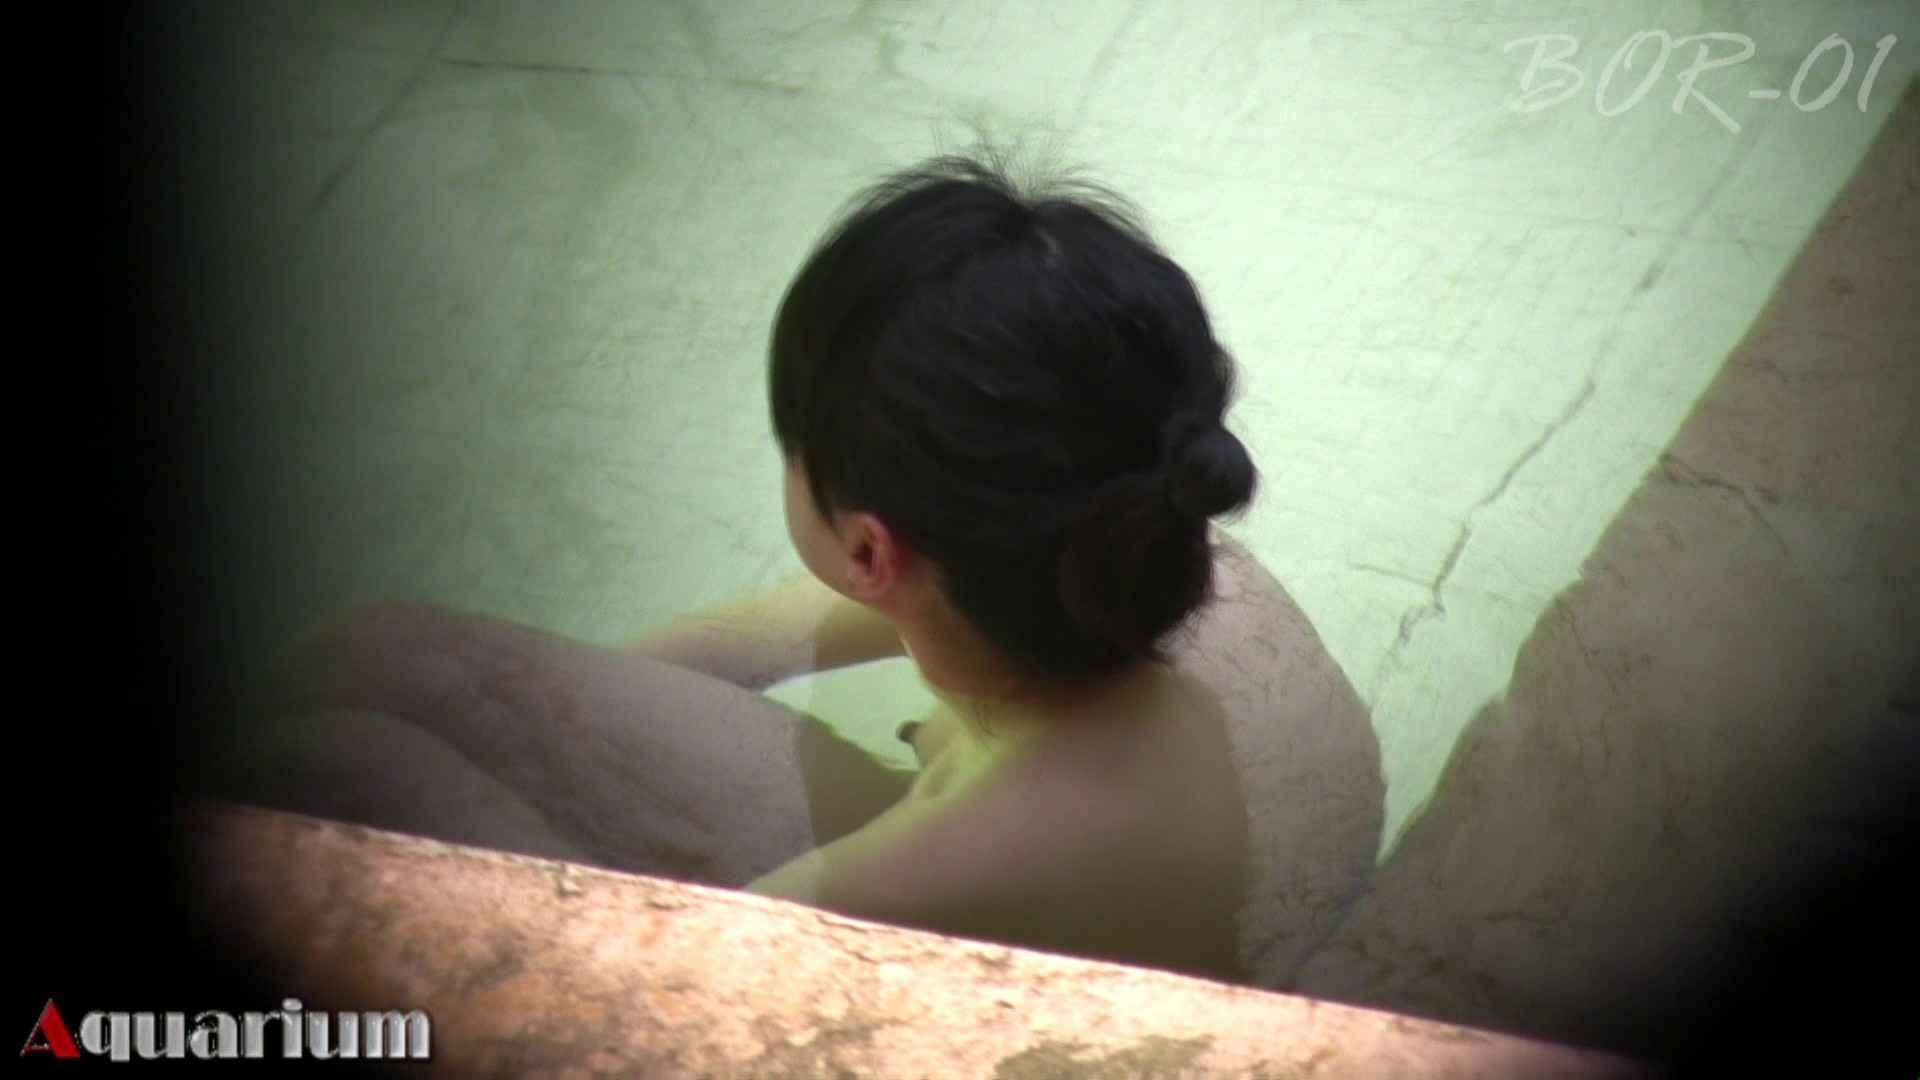 Aquaな露天風呂Vol.461 エッチな盗撮 AV無料動画キャプチャ 108pic 79